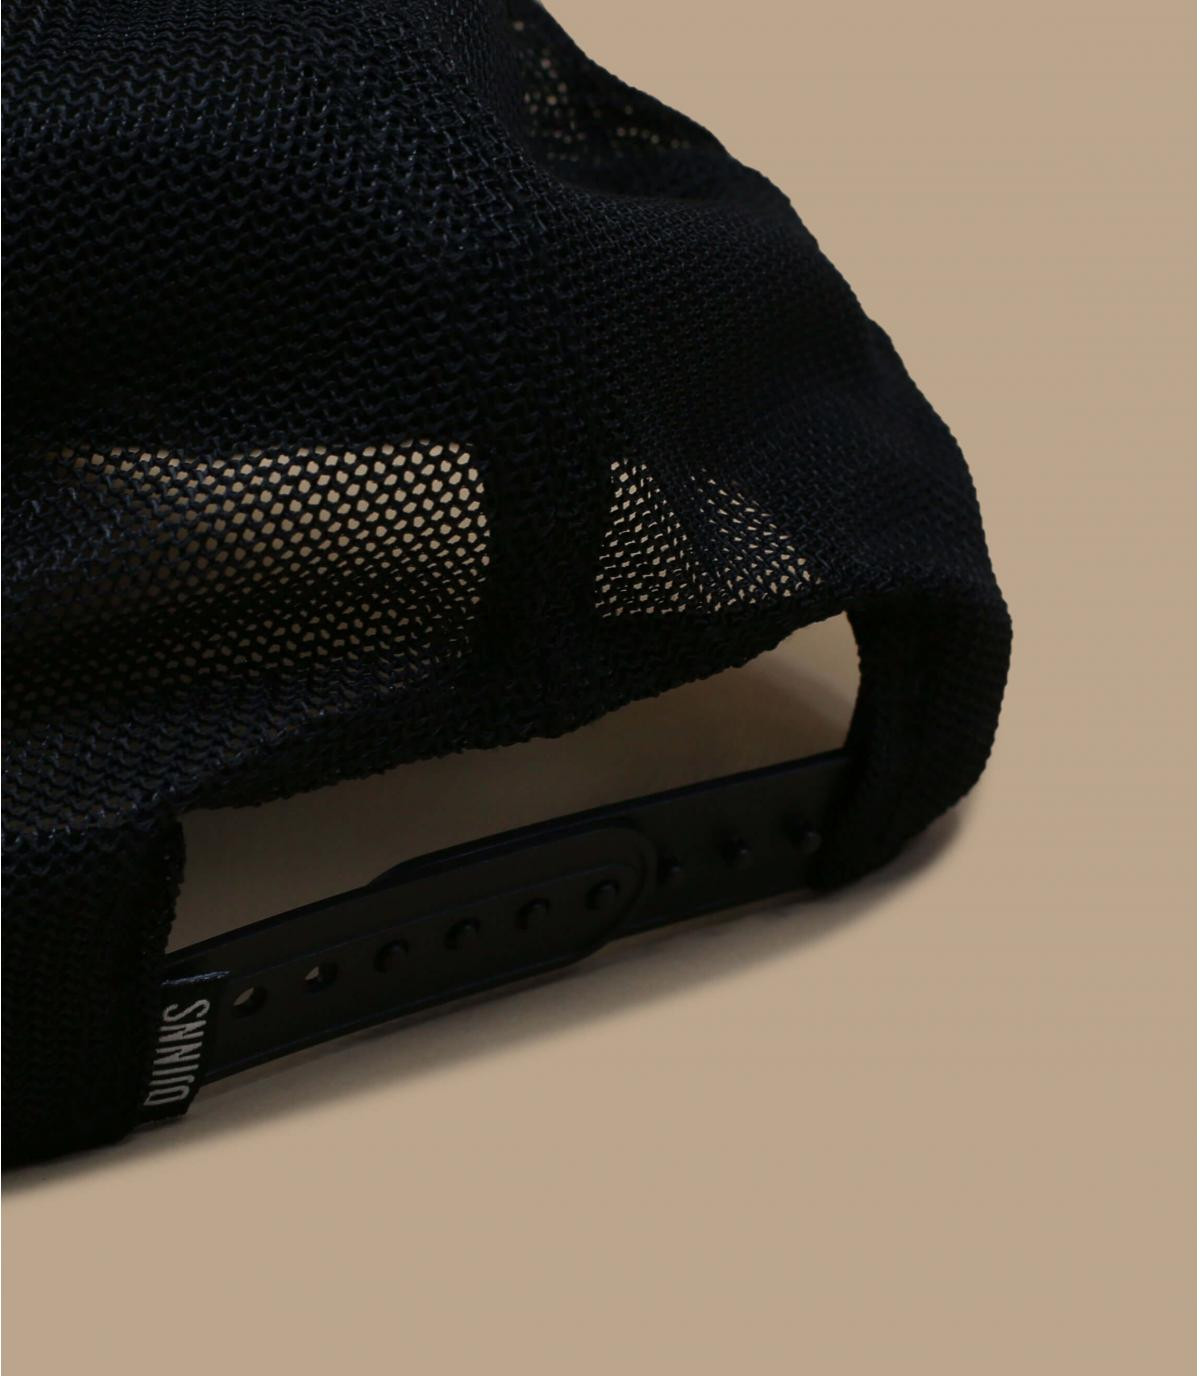 Detalles DNC Stretch Malnge black imagen 4